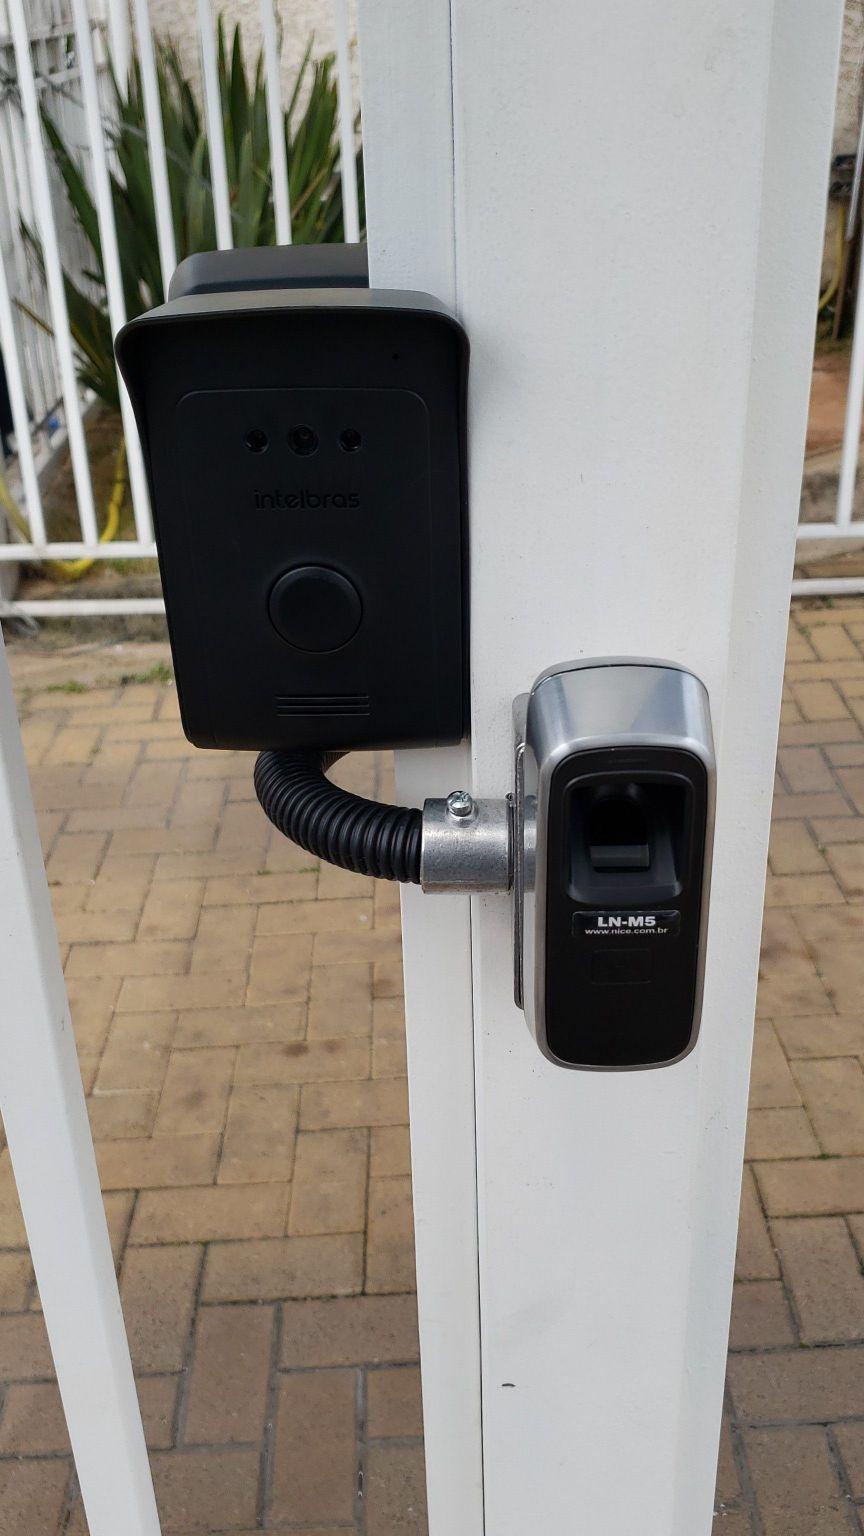 interfone, mais biometria